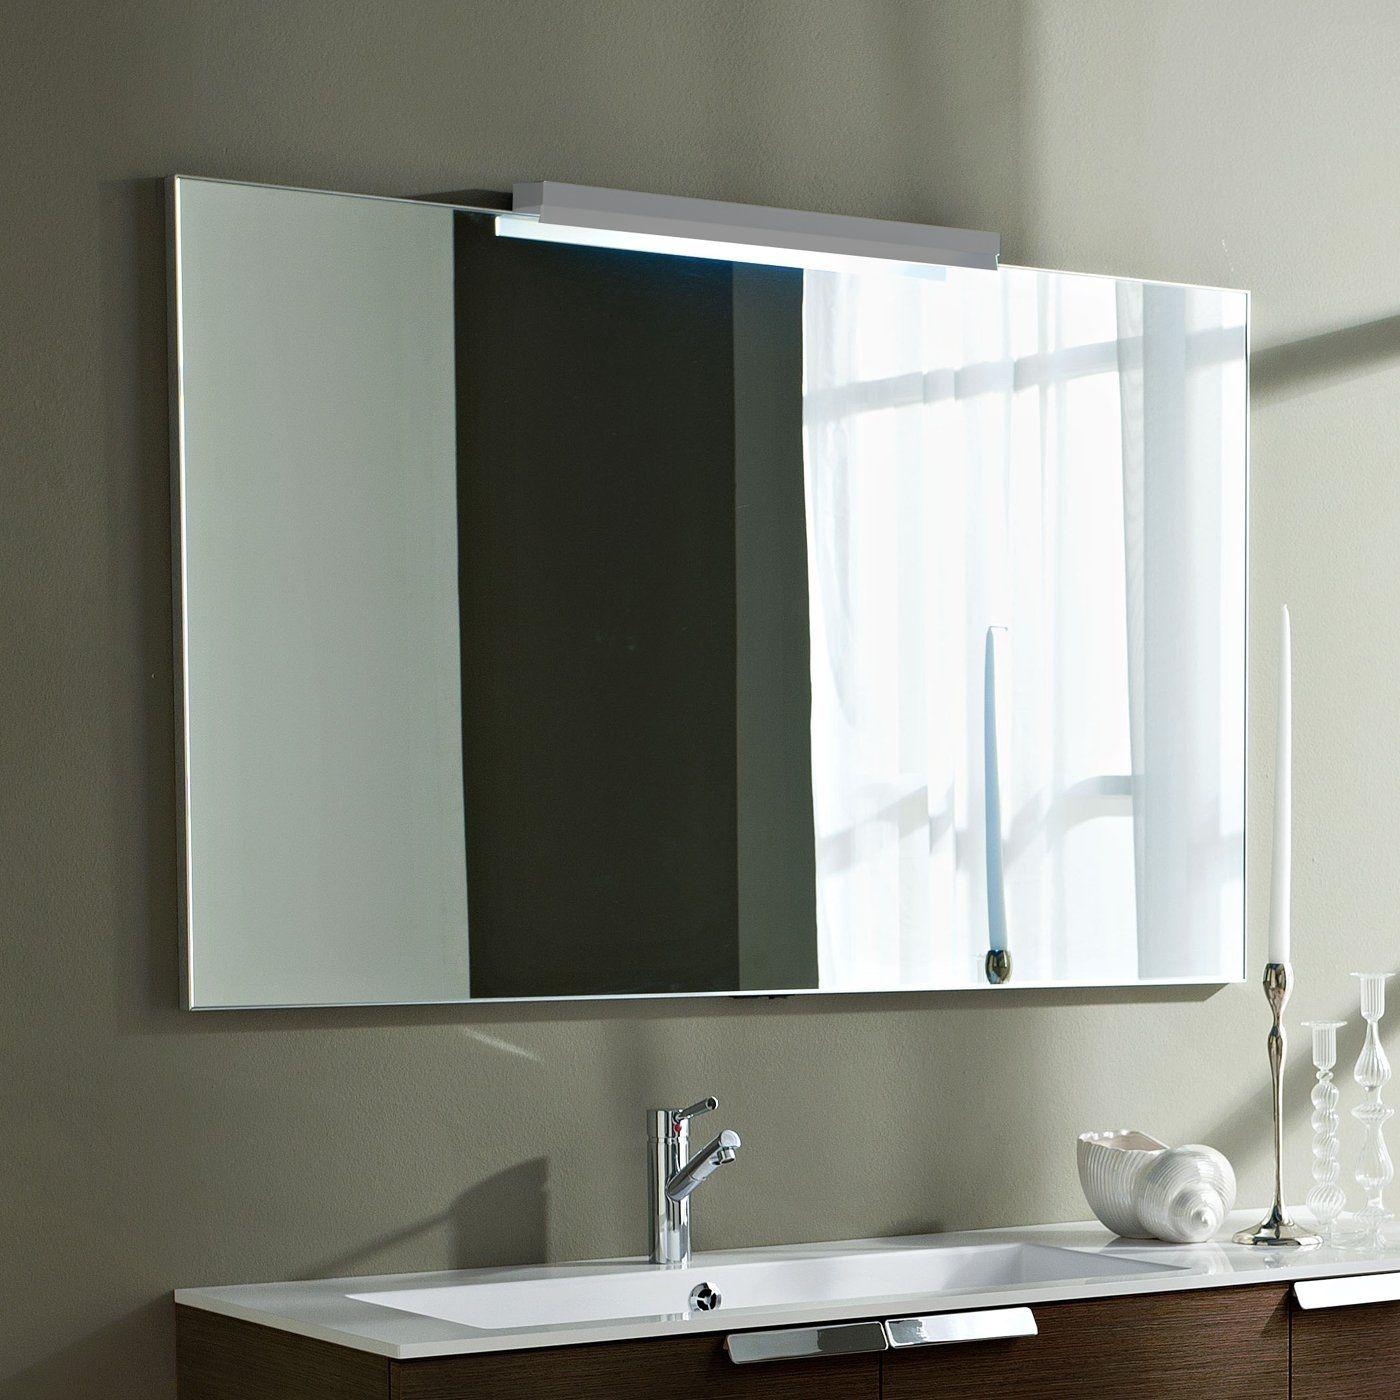 Plain square bathroom mirror drrw pinterest bathroom